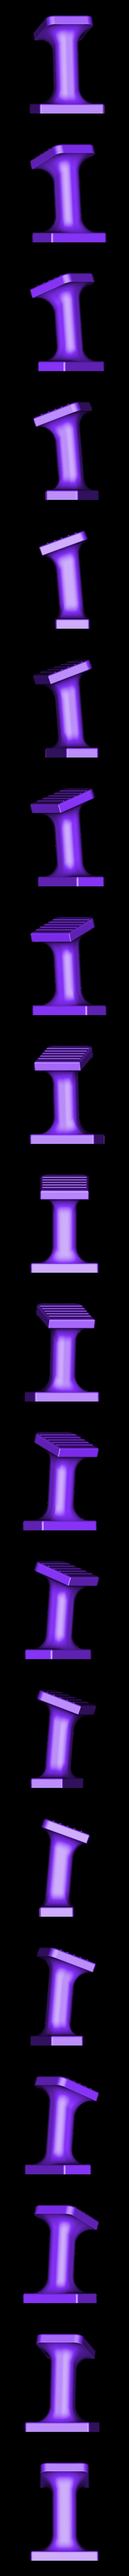 Repose_pied_quad_V2.stl Download STL file footrest for polaris quad bikes • 3D printer object, alexsamu62